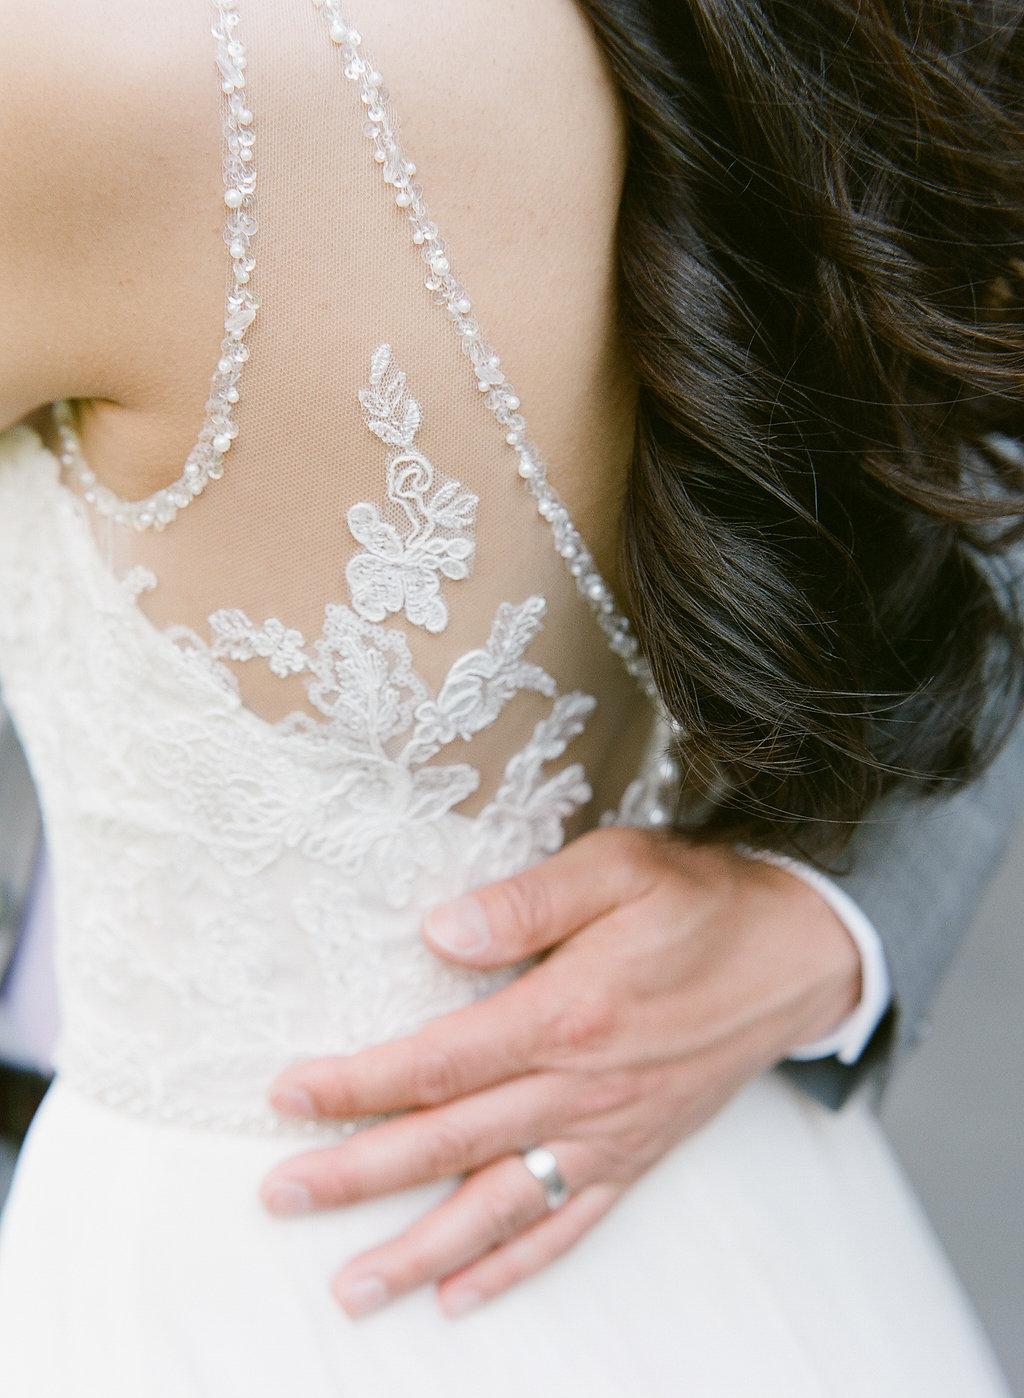 JennySoiPhotography-EJCityHallWedding-318.jpgSan Francisco City Hall Private Ceremony Wedding - Fine Art Film Photographer - Romantic film wedding